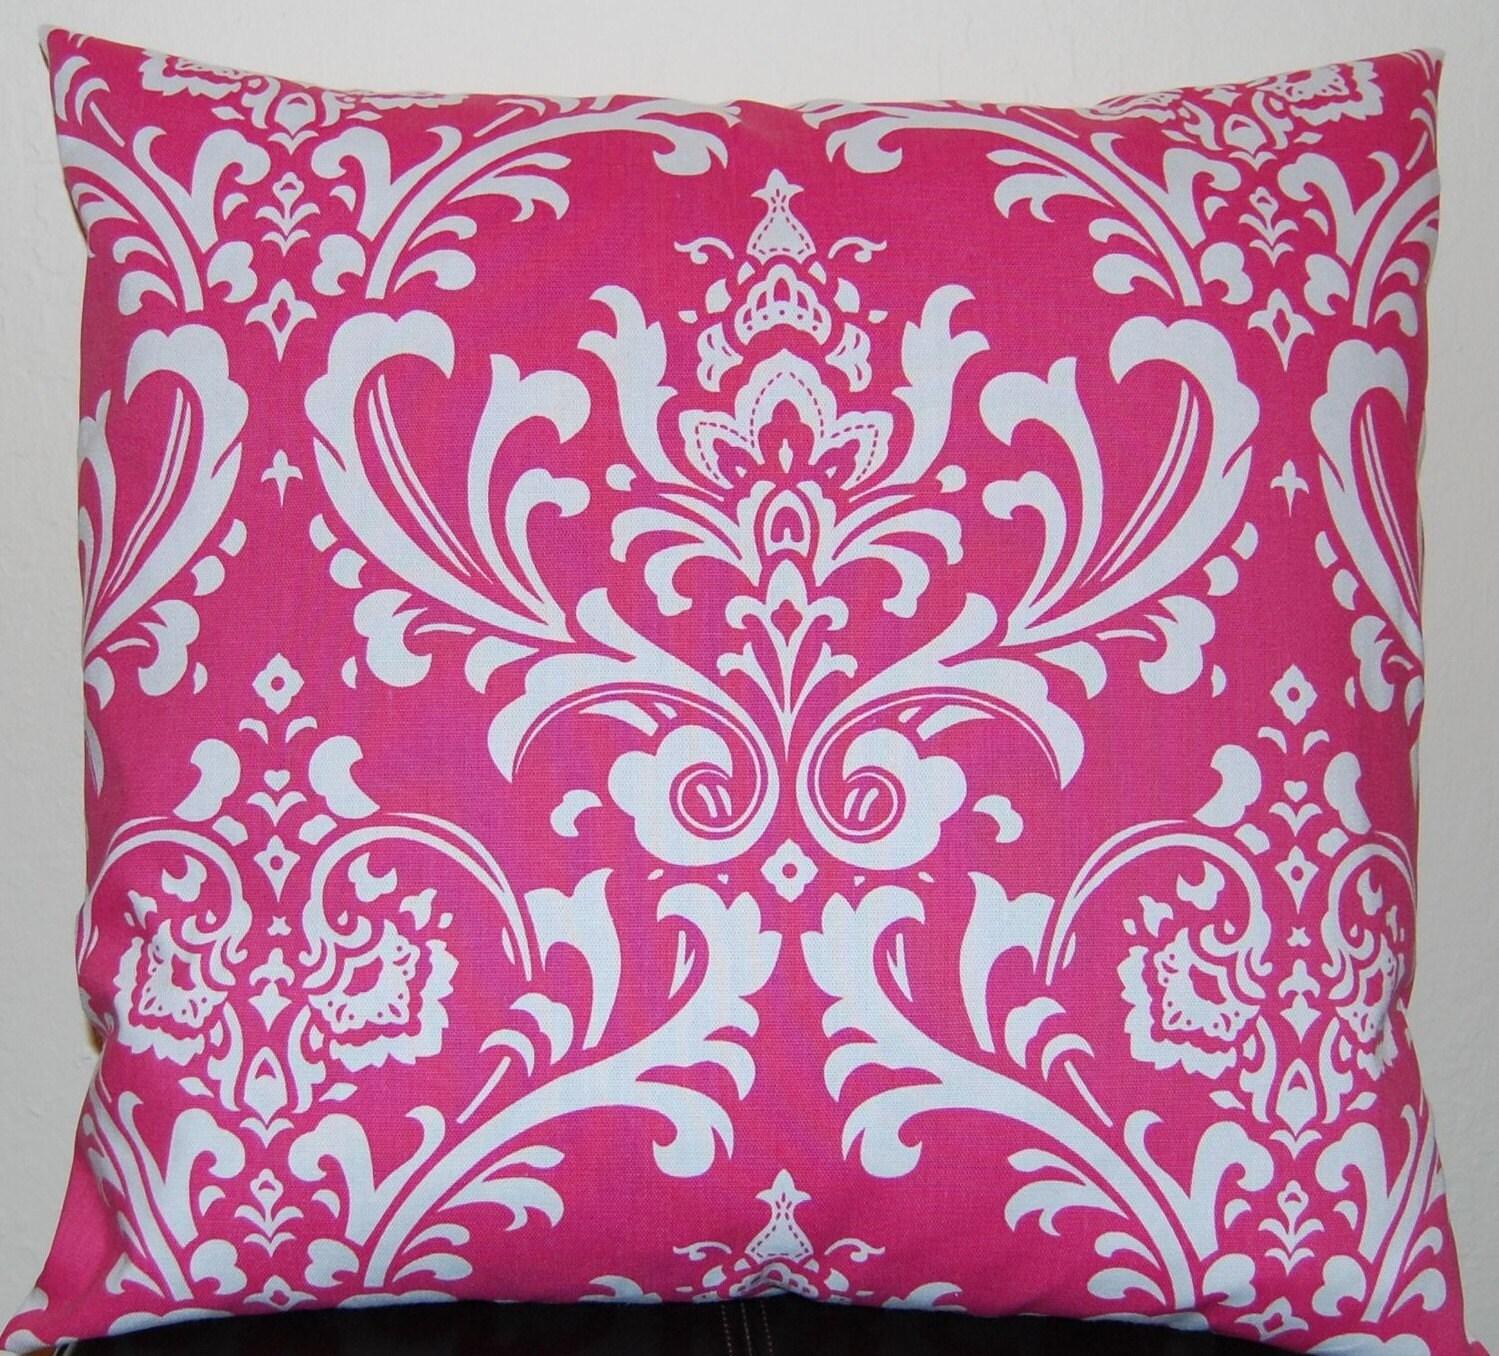 Pink Decorative Pillow Covers : Pink Pillows Decorative Throw Pillow Covers by FestiveHomeDecor